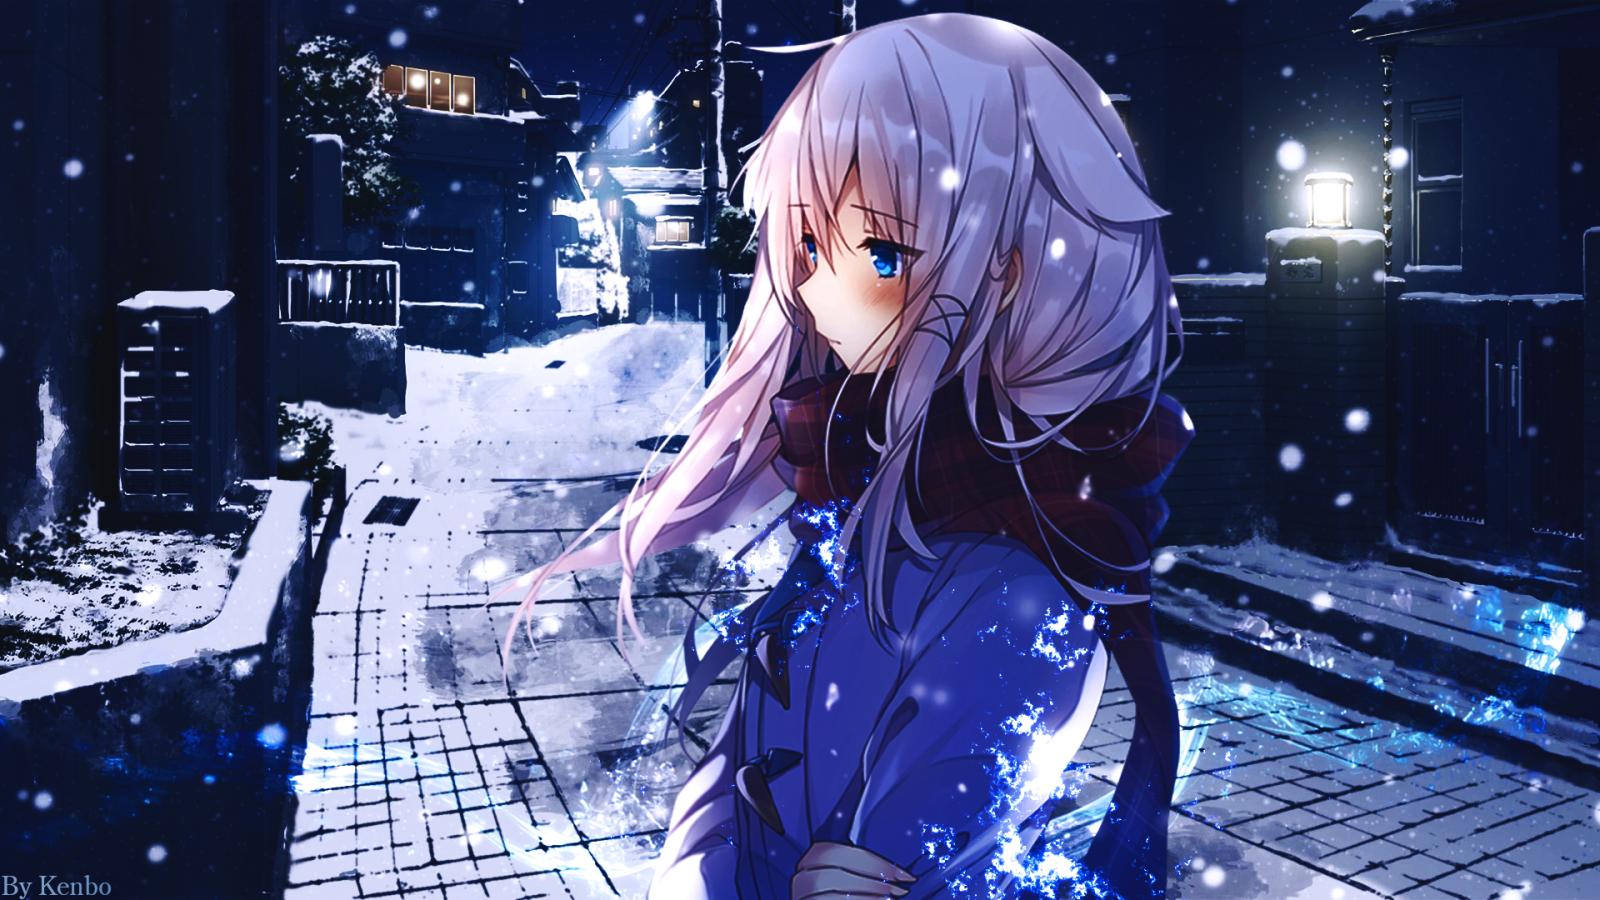 Wallpaper : anime girls, snow 1920x1080 - shaunski ...